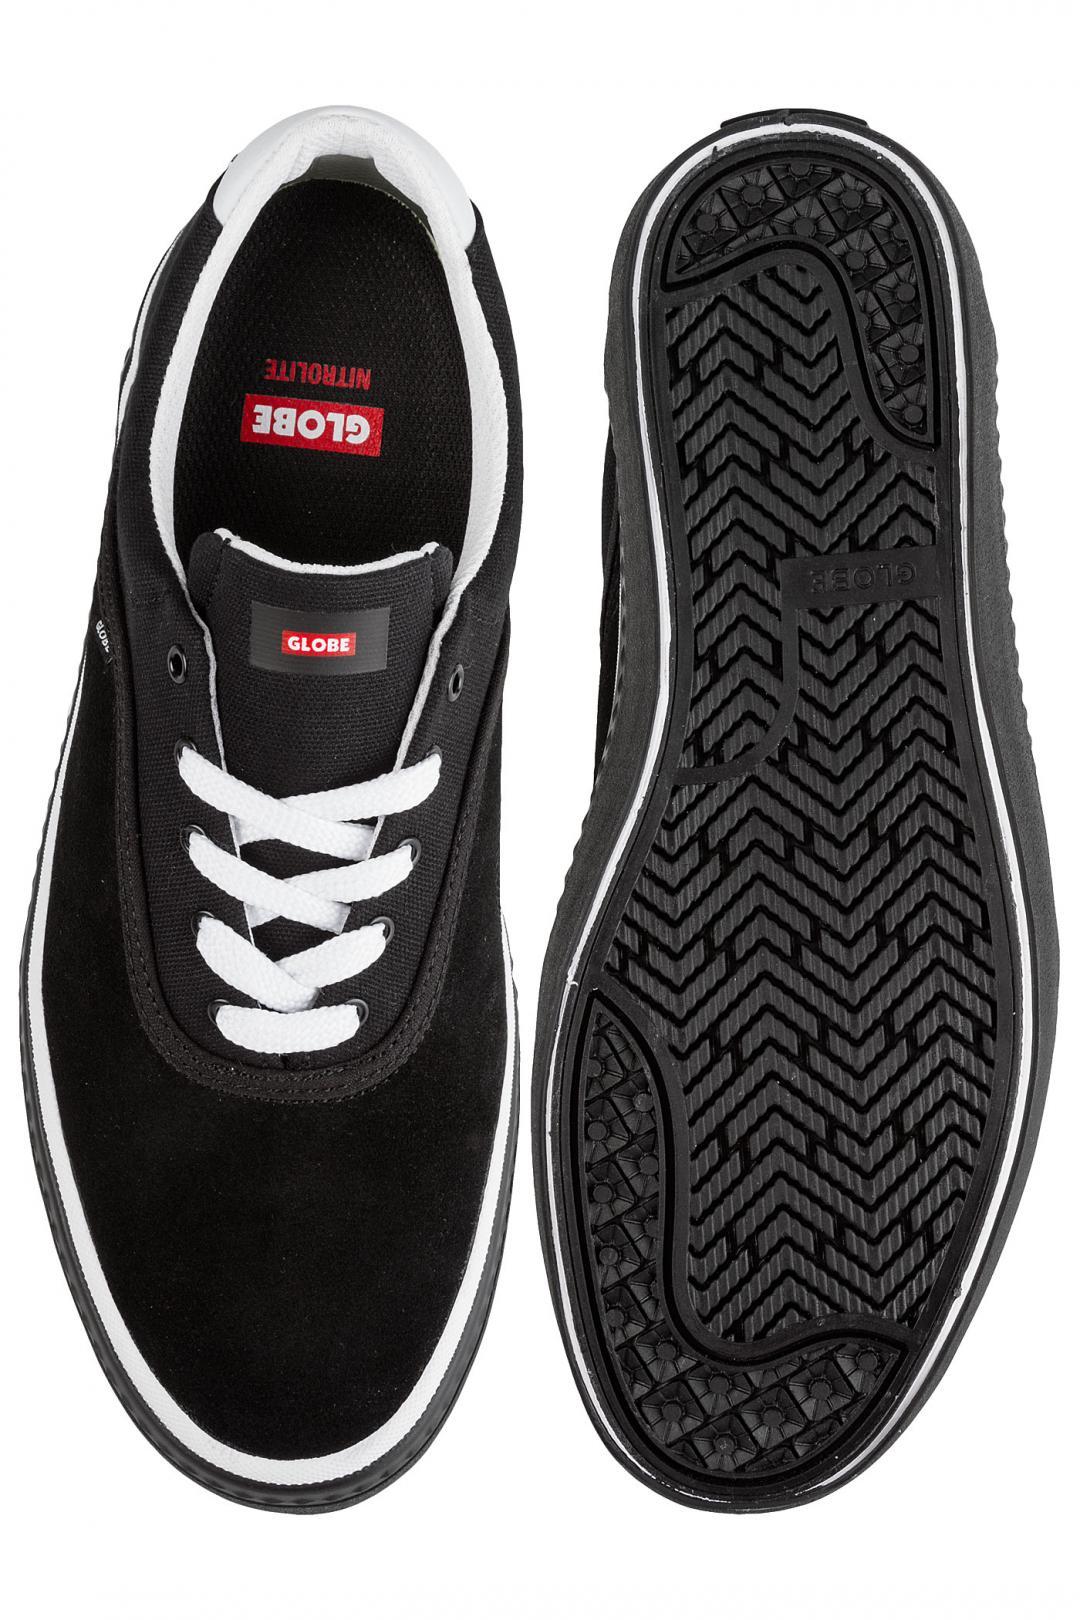 Uomo Globe Sprout black core noa   Sneakers low top